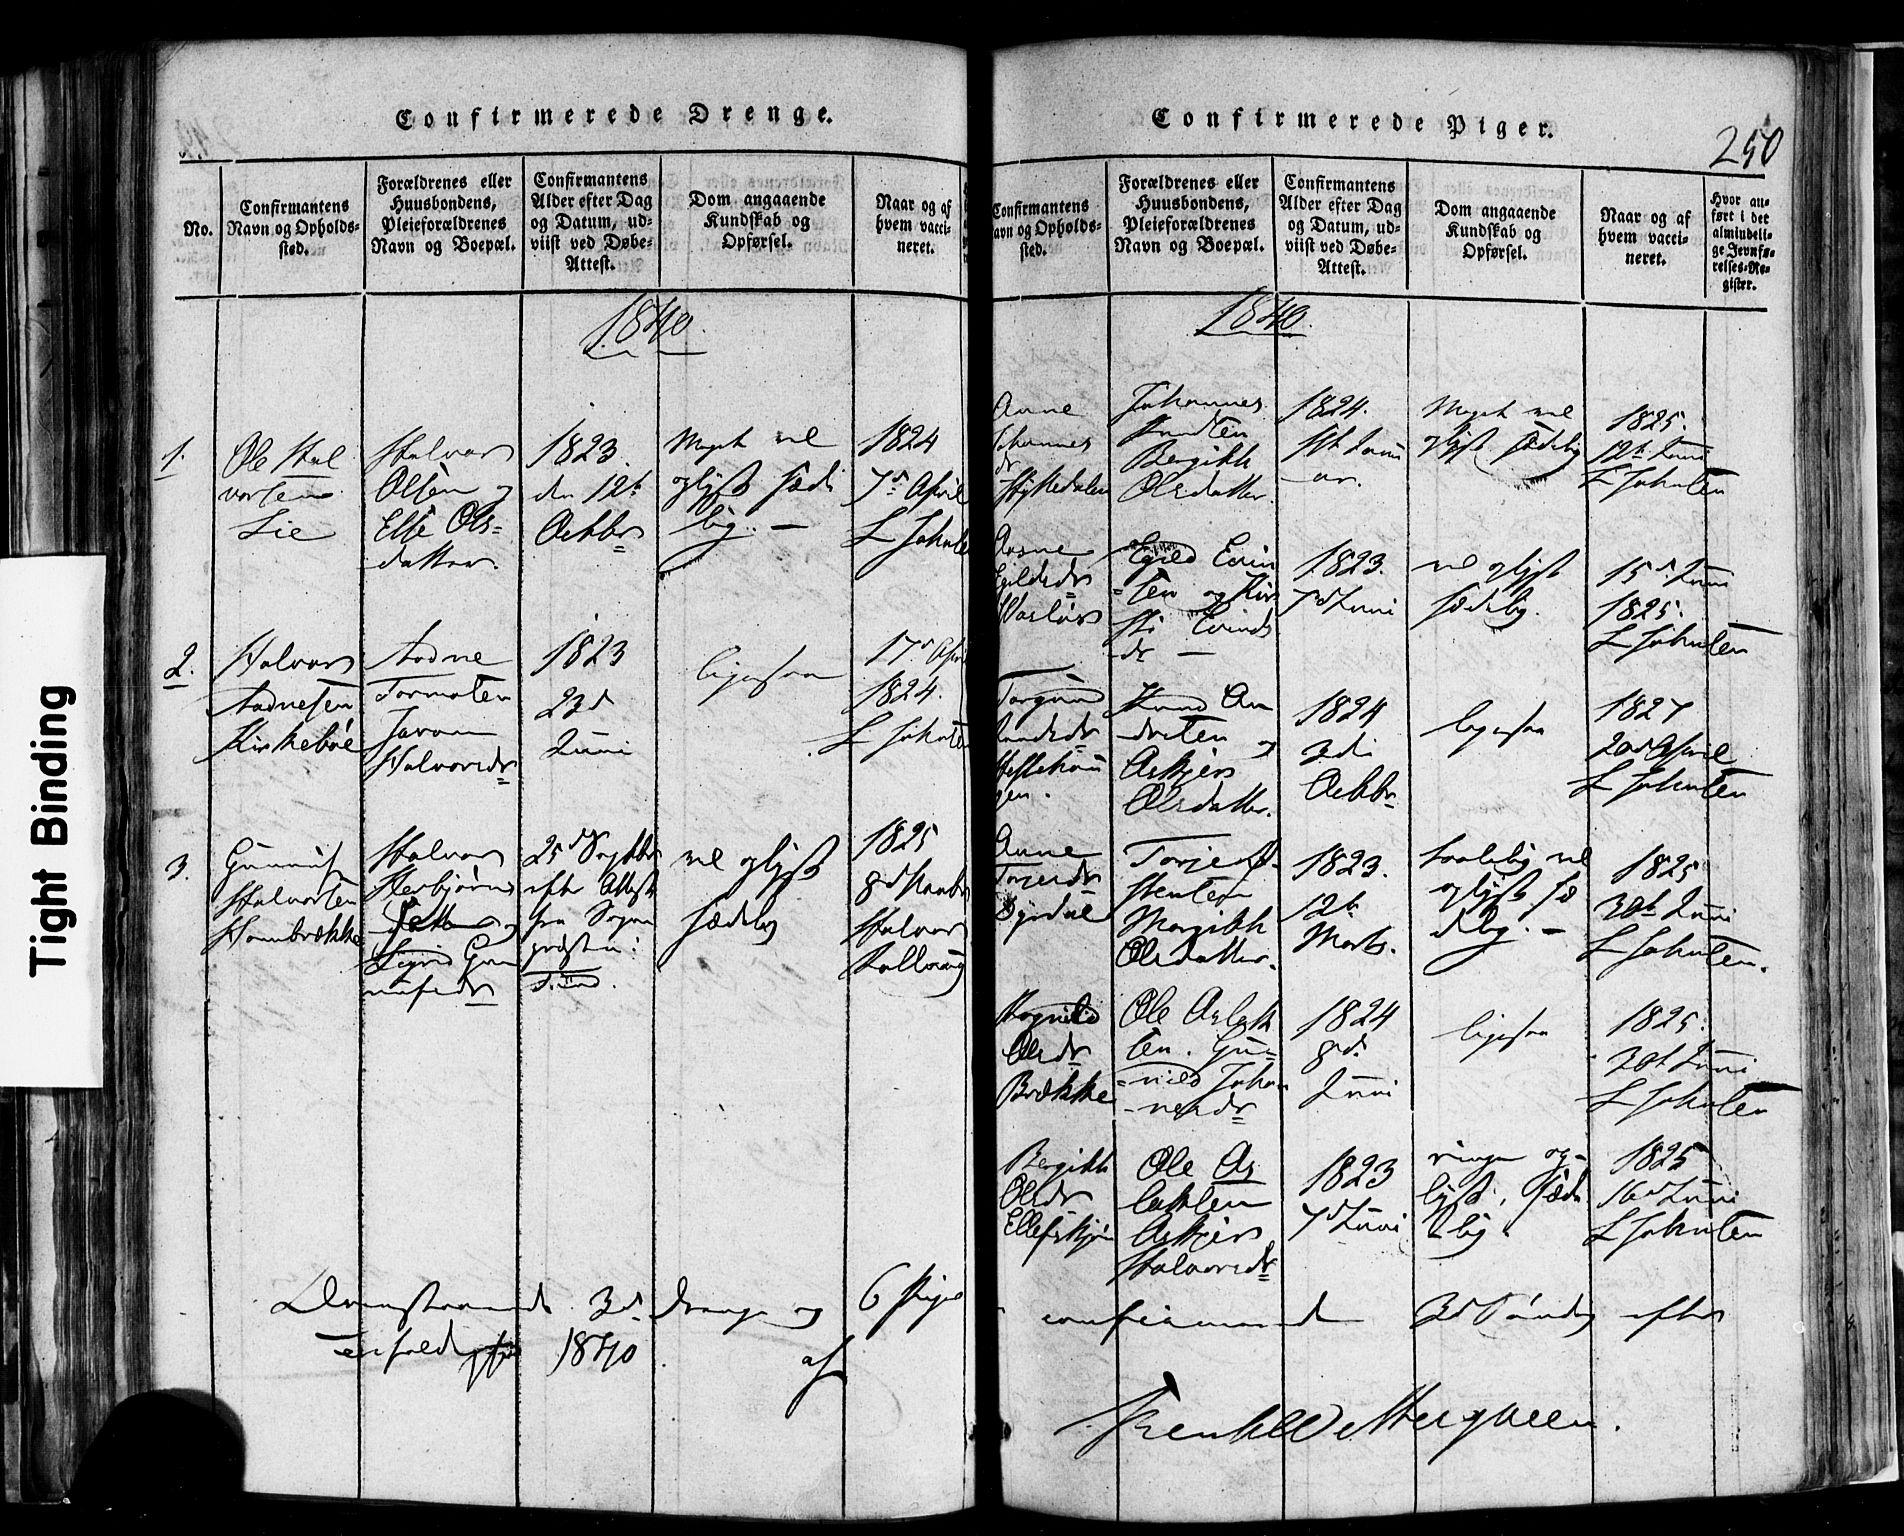 SAKO, Rauland kirkebøker, F/Fa/L0002: Ministerialbok nr. 2, 1815-1860, s. 250